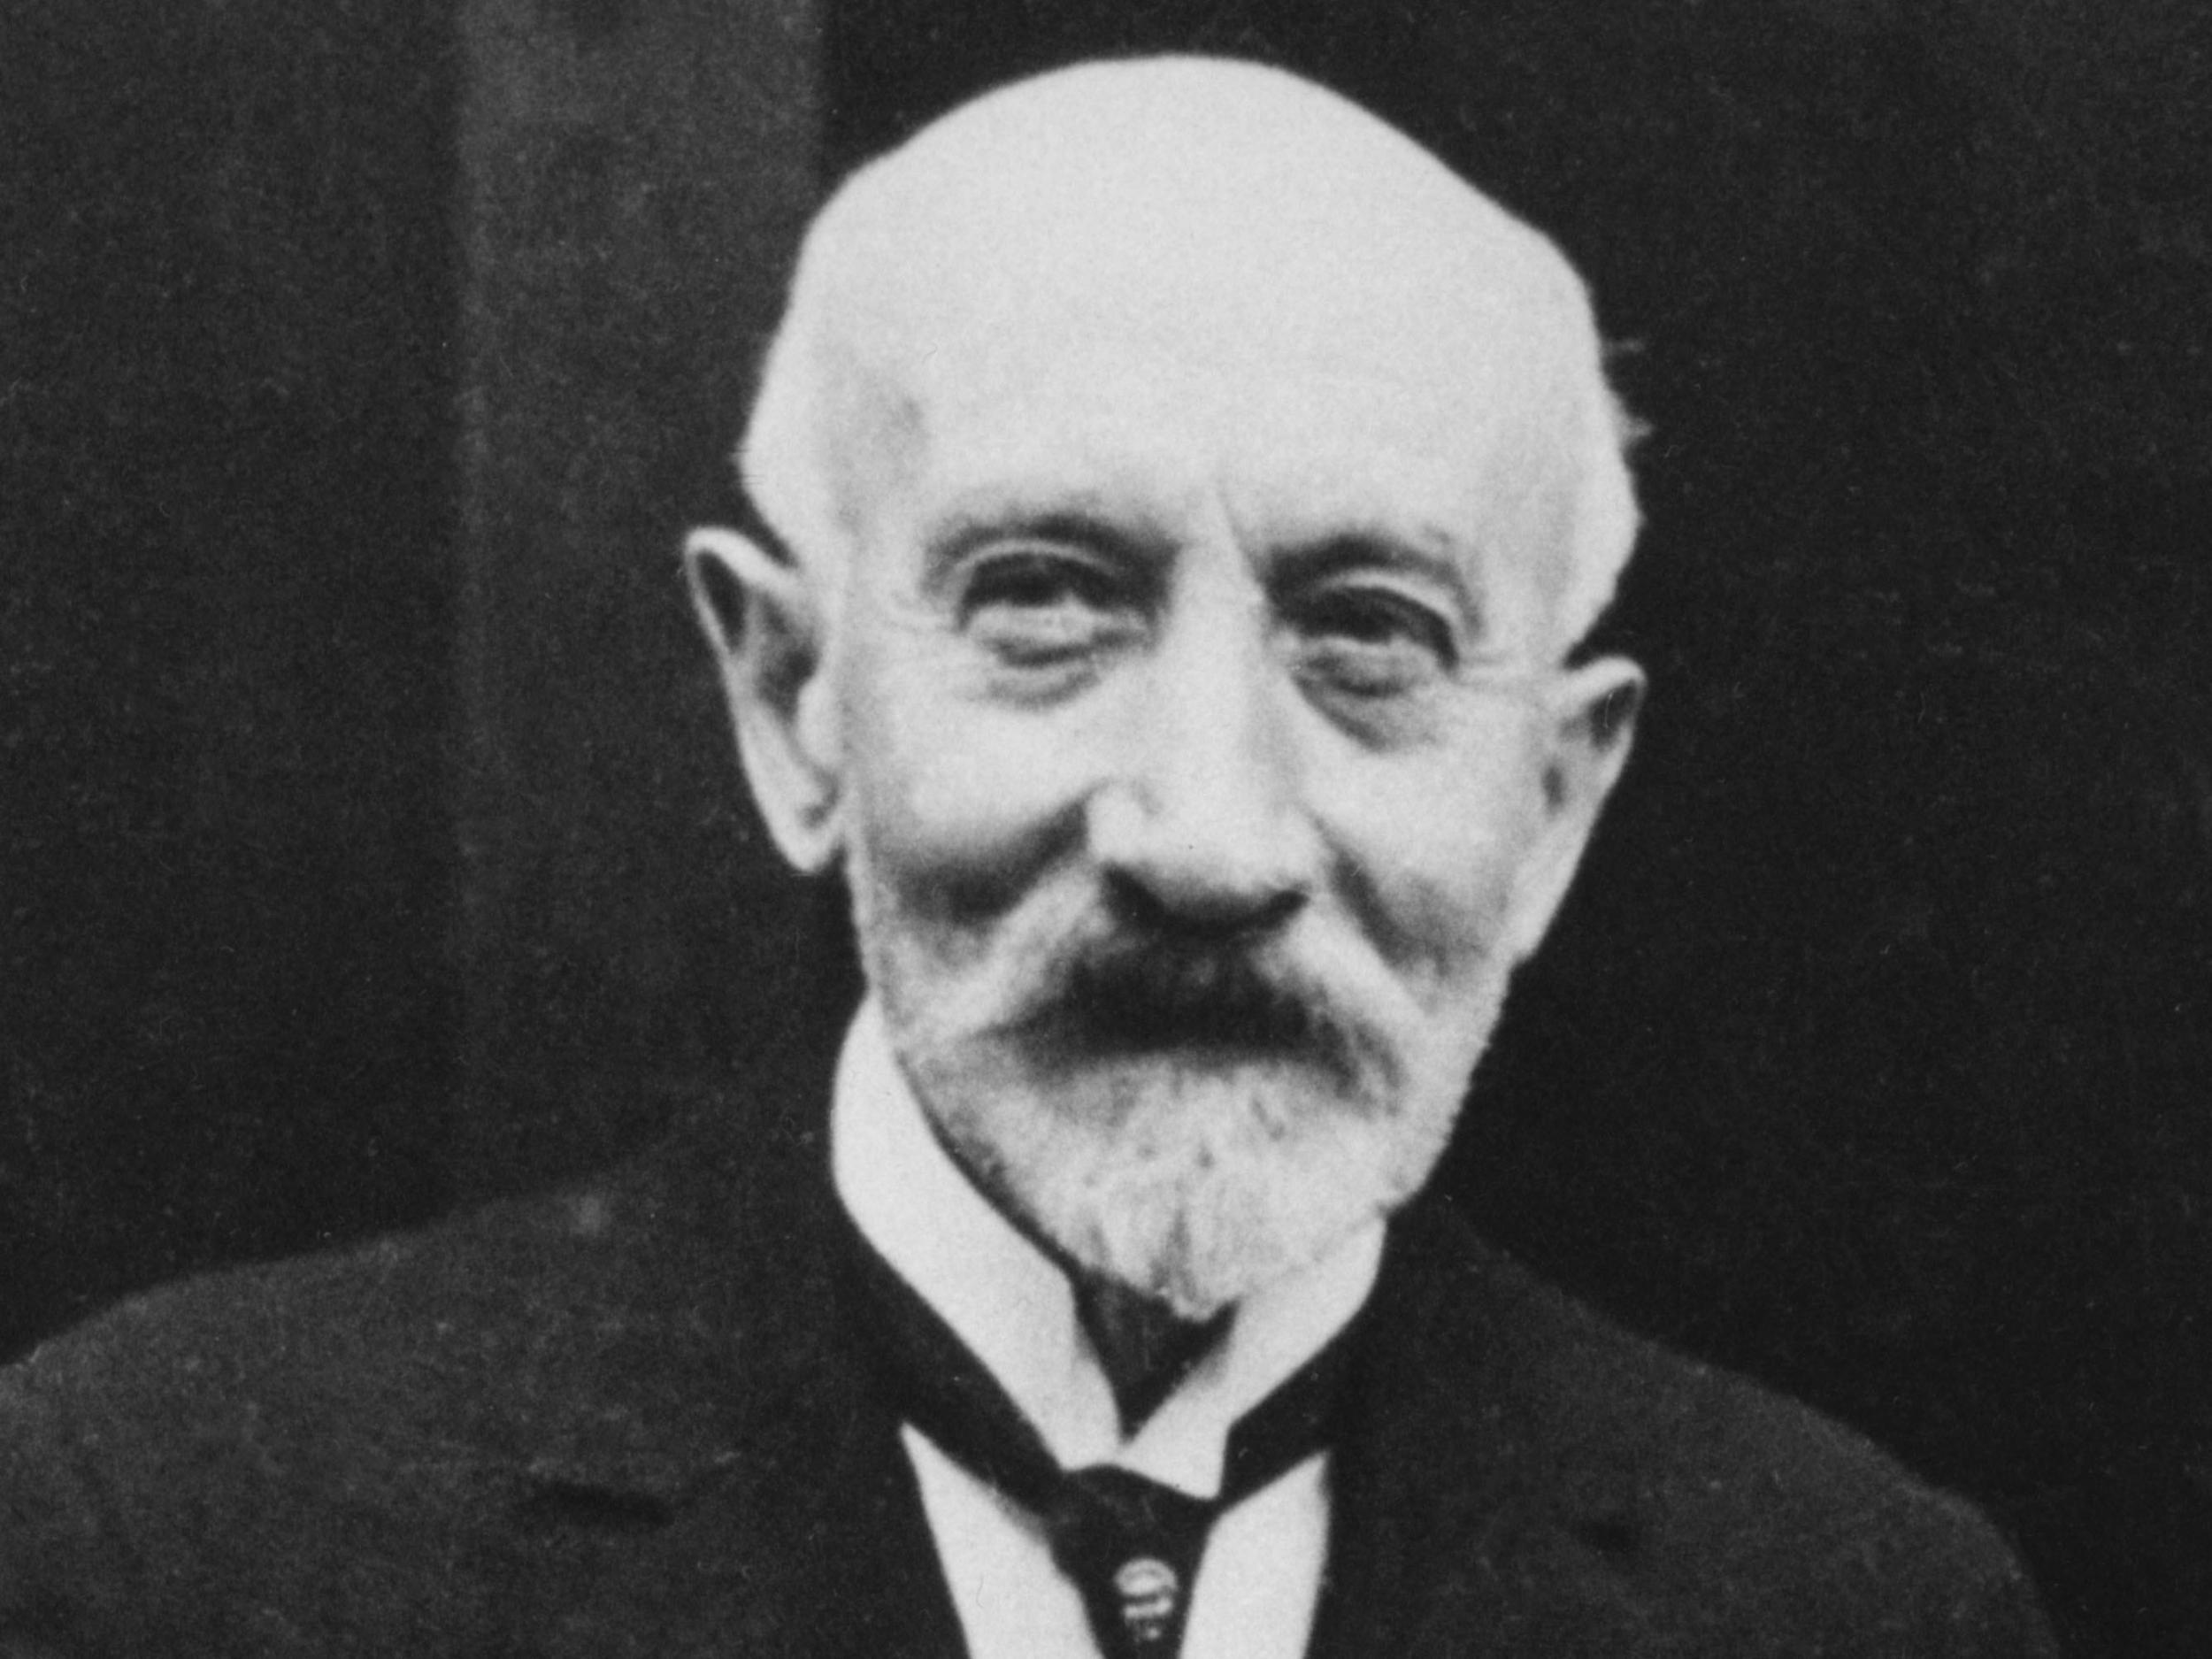 Life After Death: l'intervista al regista ed illusionista Georges Méliès